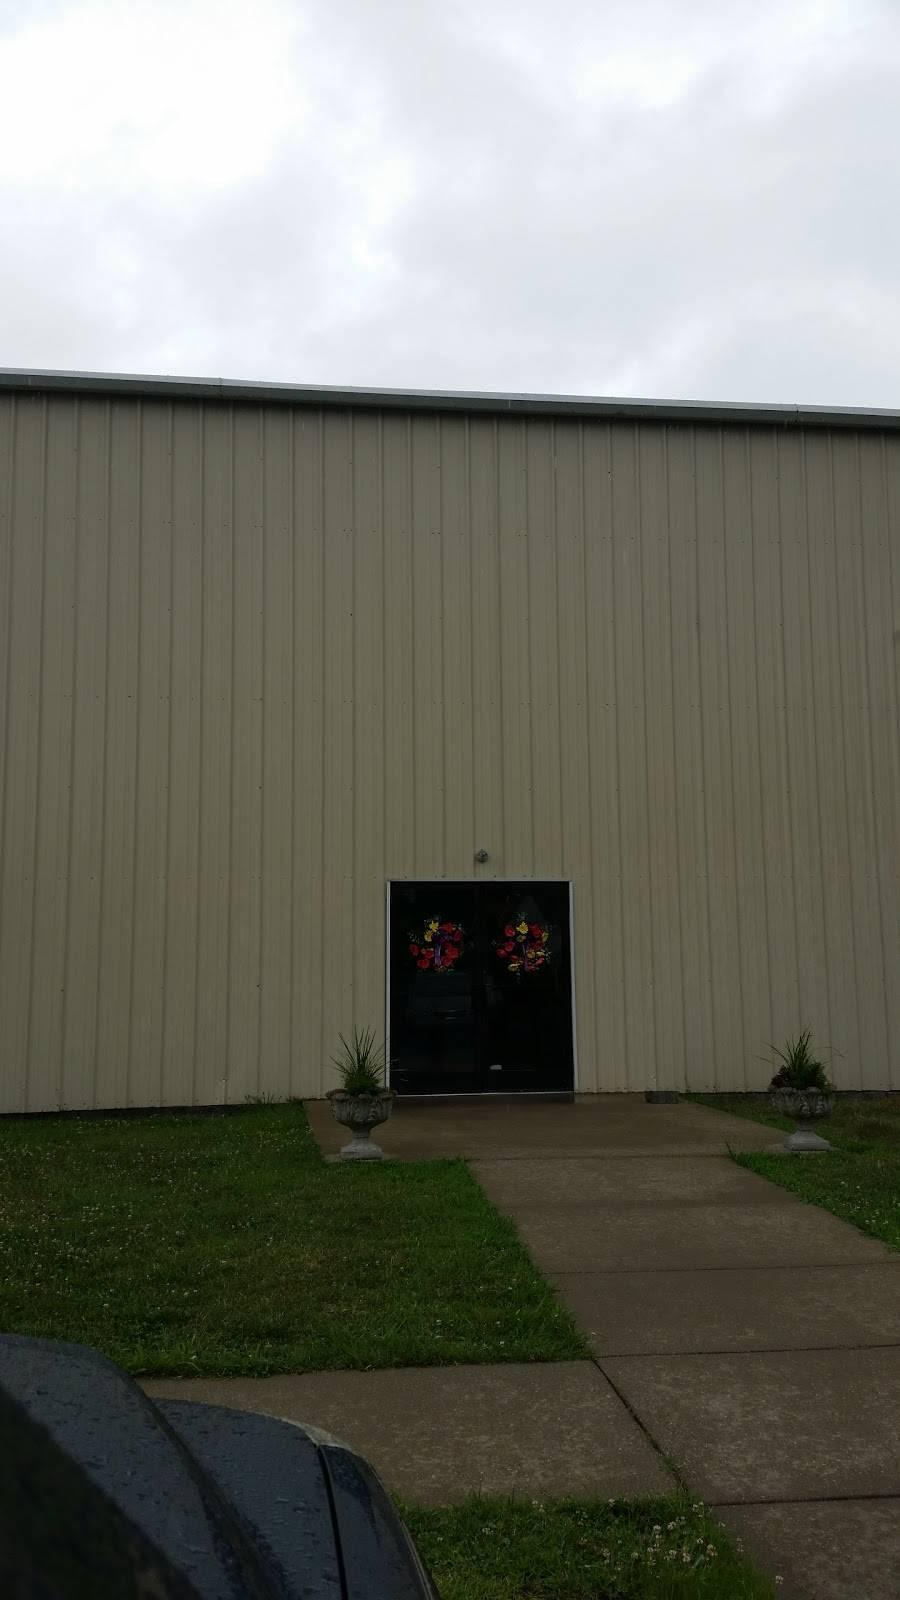 Highview Church of God - church  | Photo 3 of 3 | Address: 7017 S Watterson Trail, Louisville, KY 40291, USA | Phone: (502) 231-2345